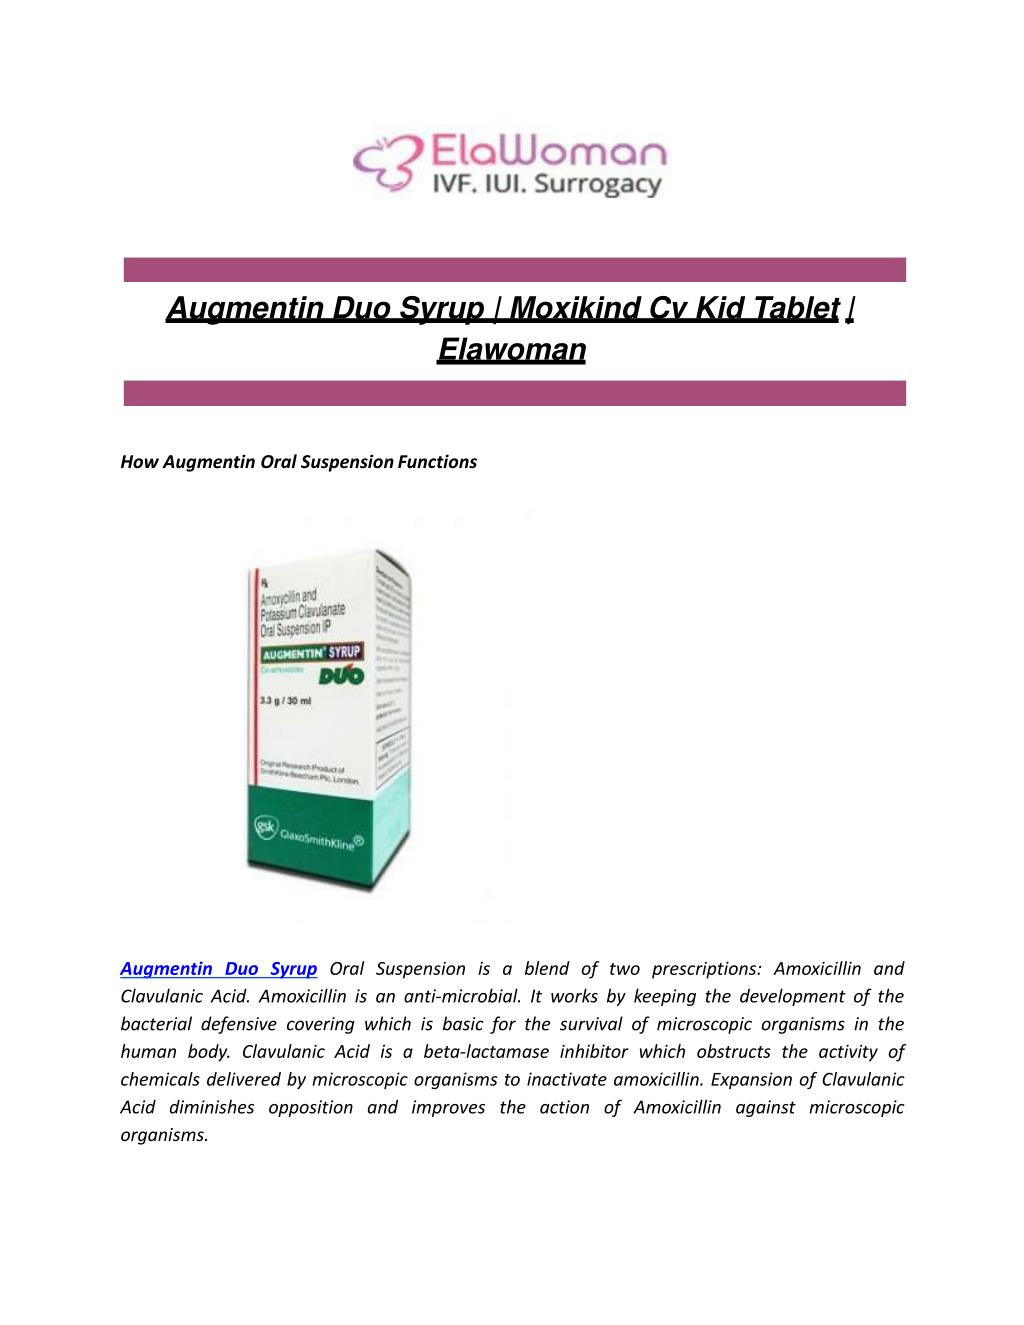 Features of Augmentin in children